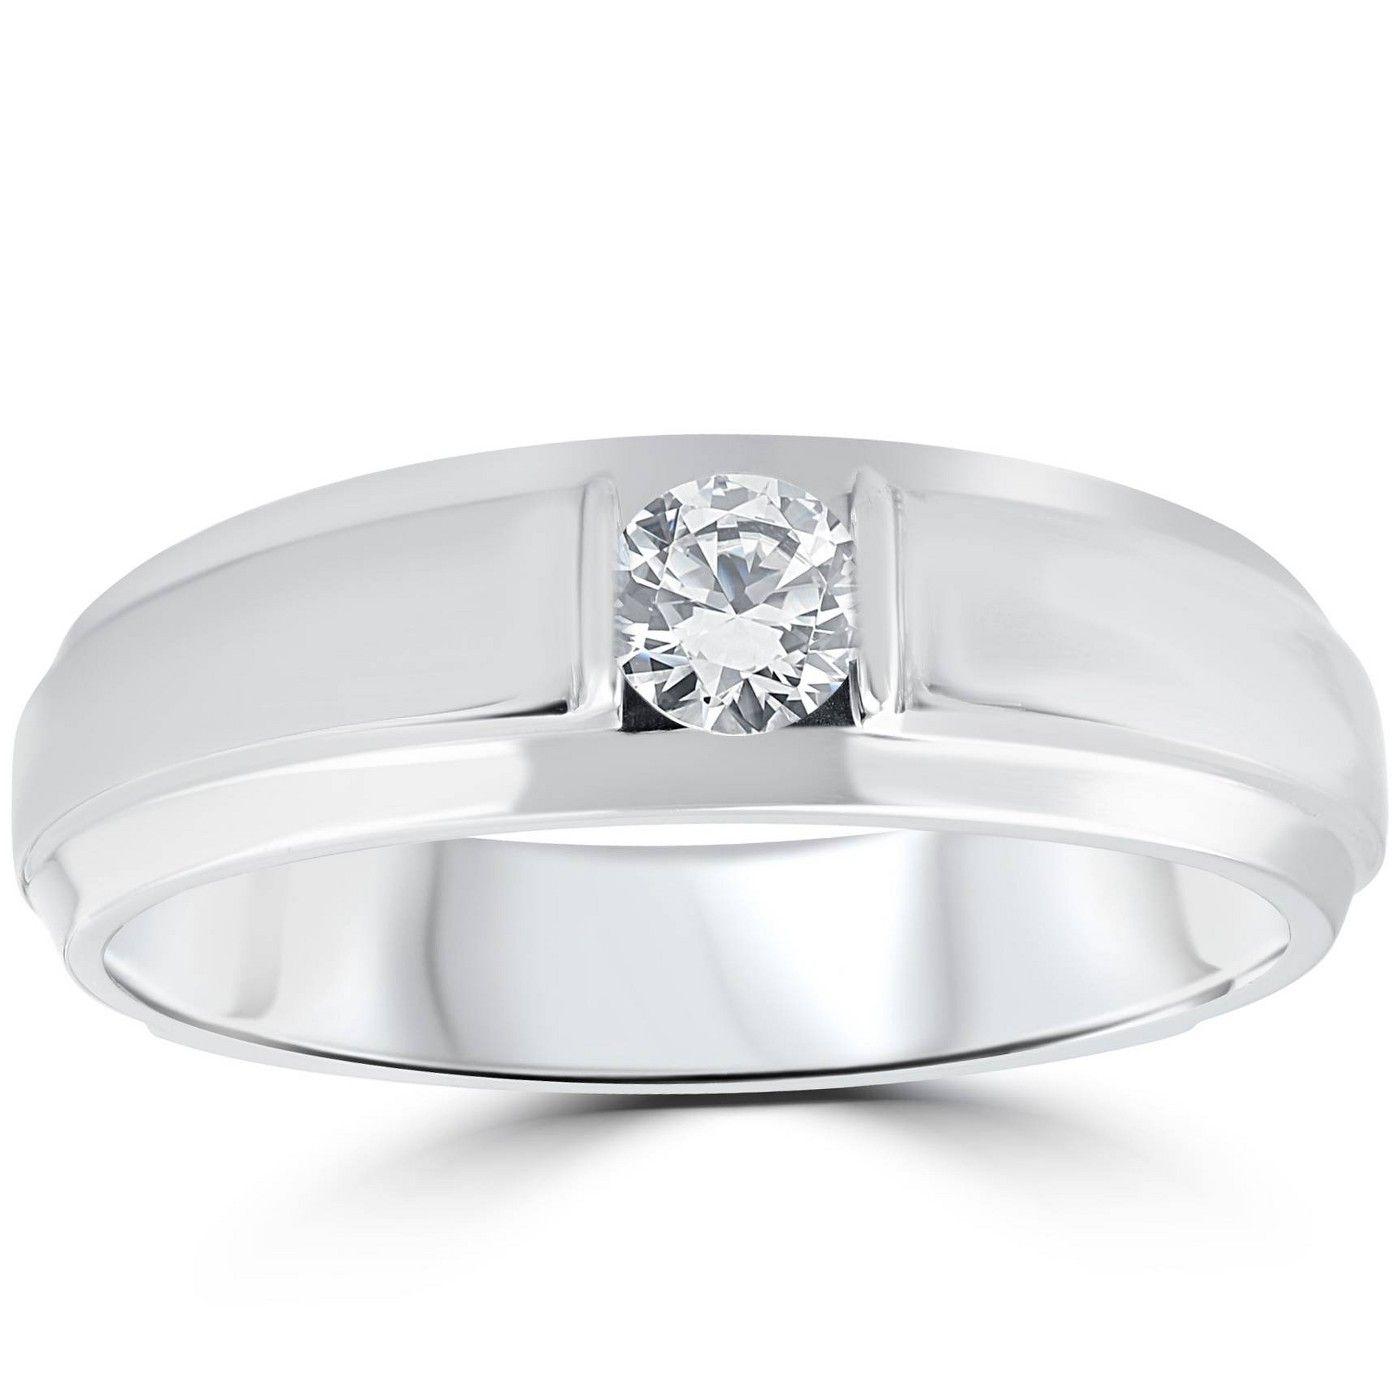 Pompeii3 1 6ct Mens Diamond Solitaire Ring 10k White Gold Diamond Solitaire Rings Men Diamond Ring Mens Rings Wedding Diamond